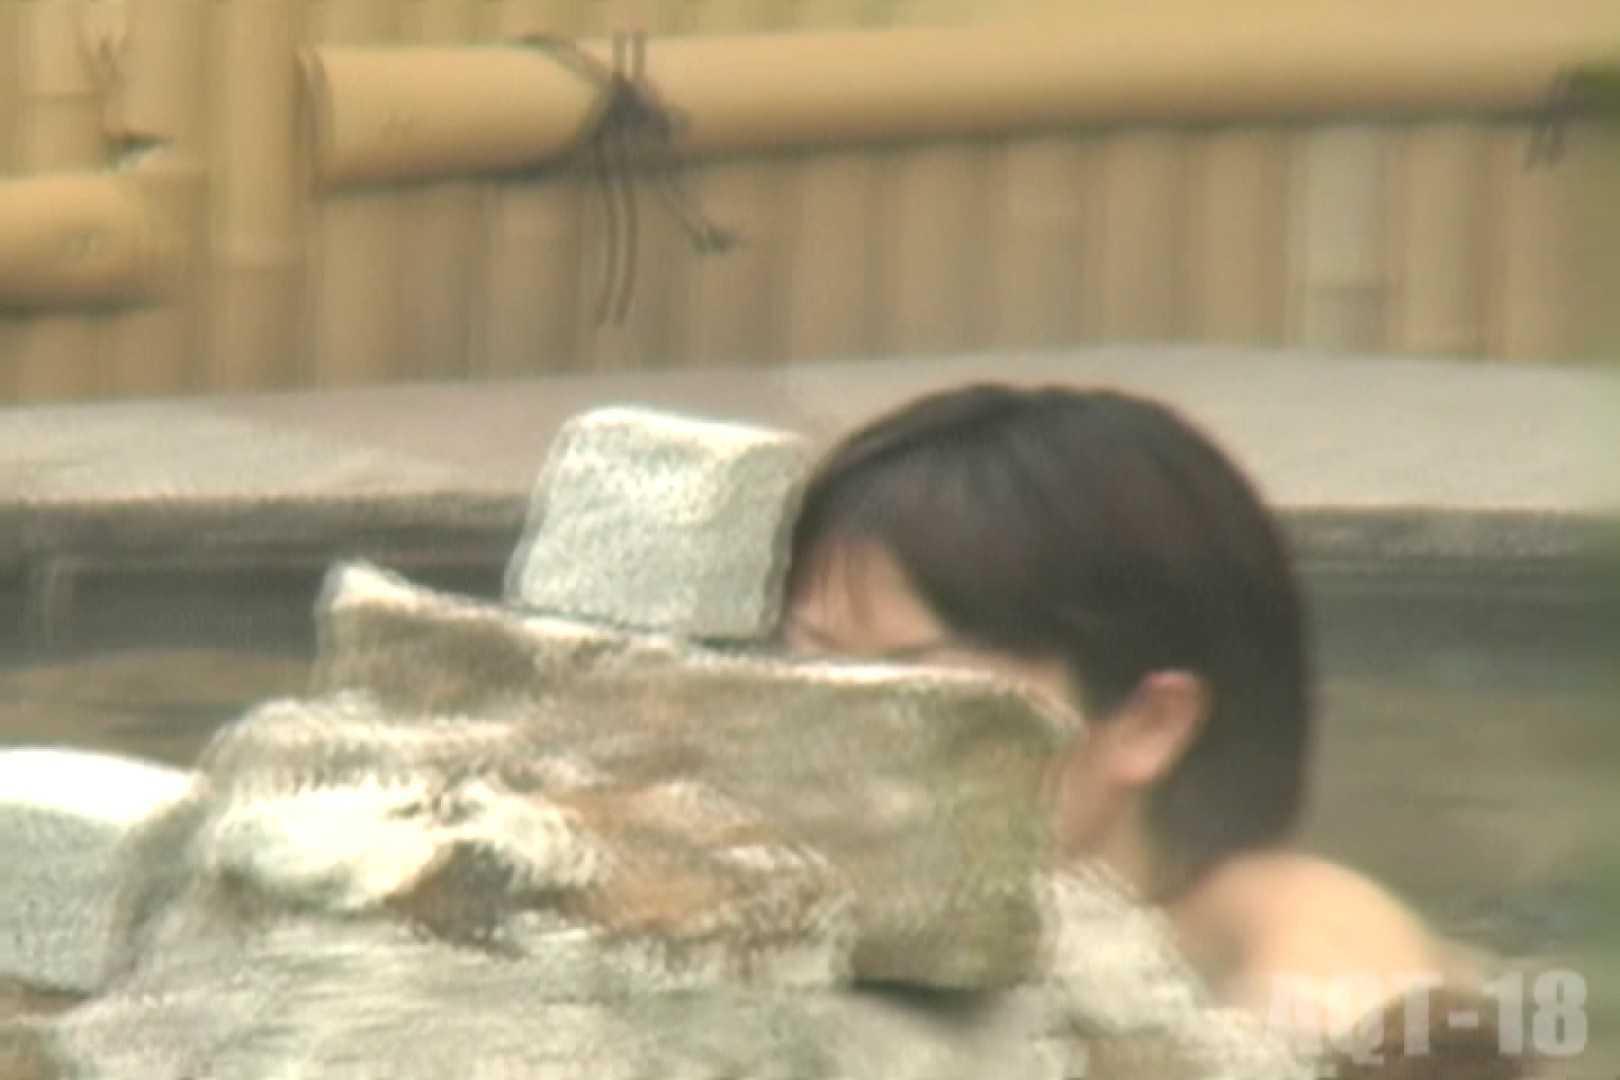 Aquaな露天風呂Vol.861 露天風呂 オメコ無修正動画無料 107連発 71